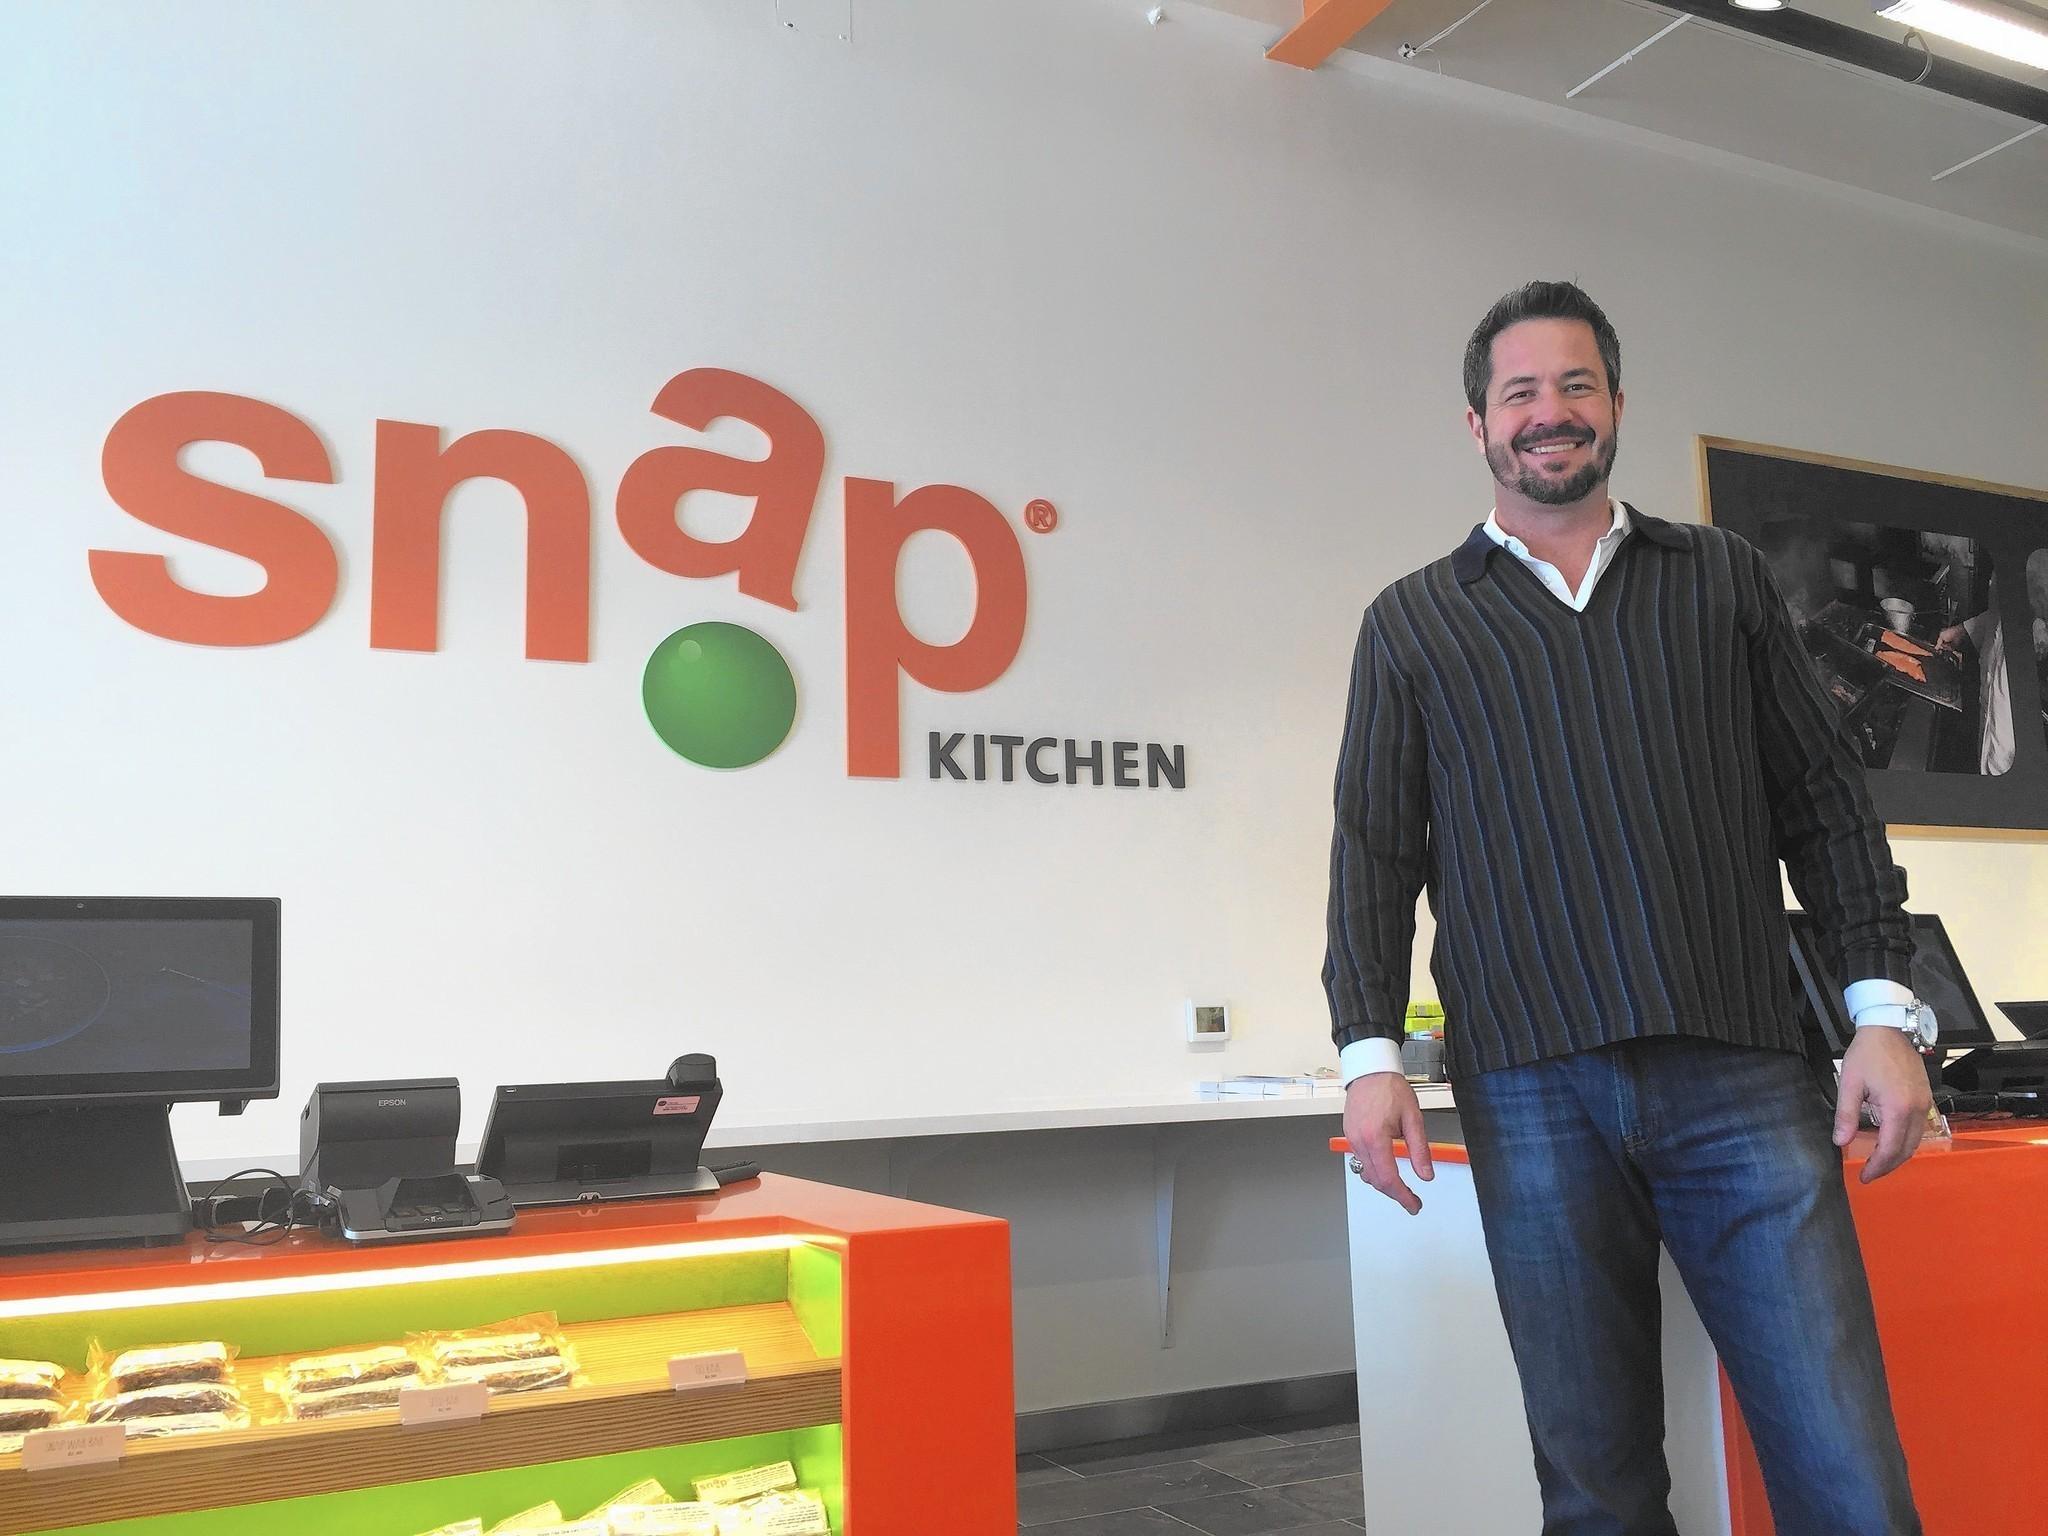 Snap Kitchen serving quick, healthy meals in Park Ridge - Park Ridge ...